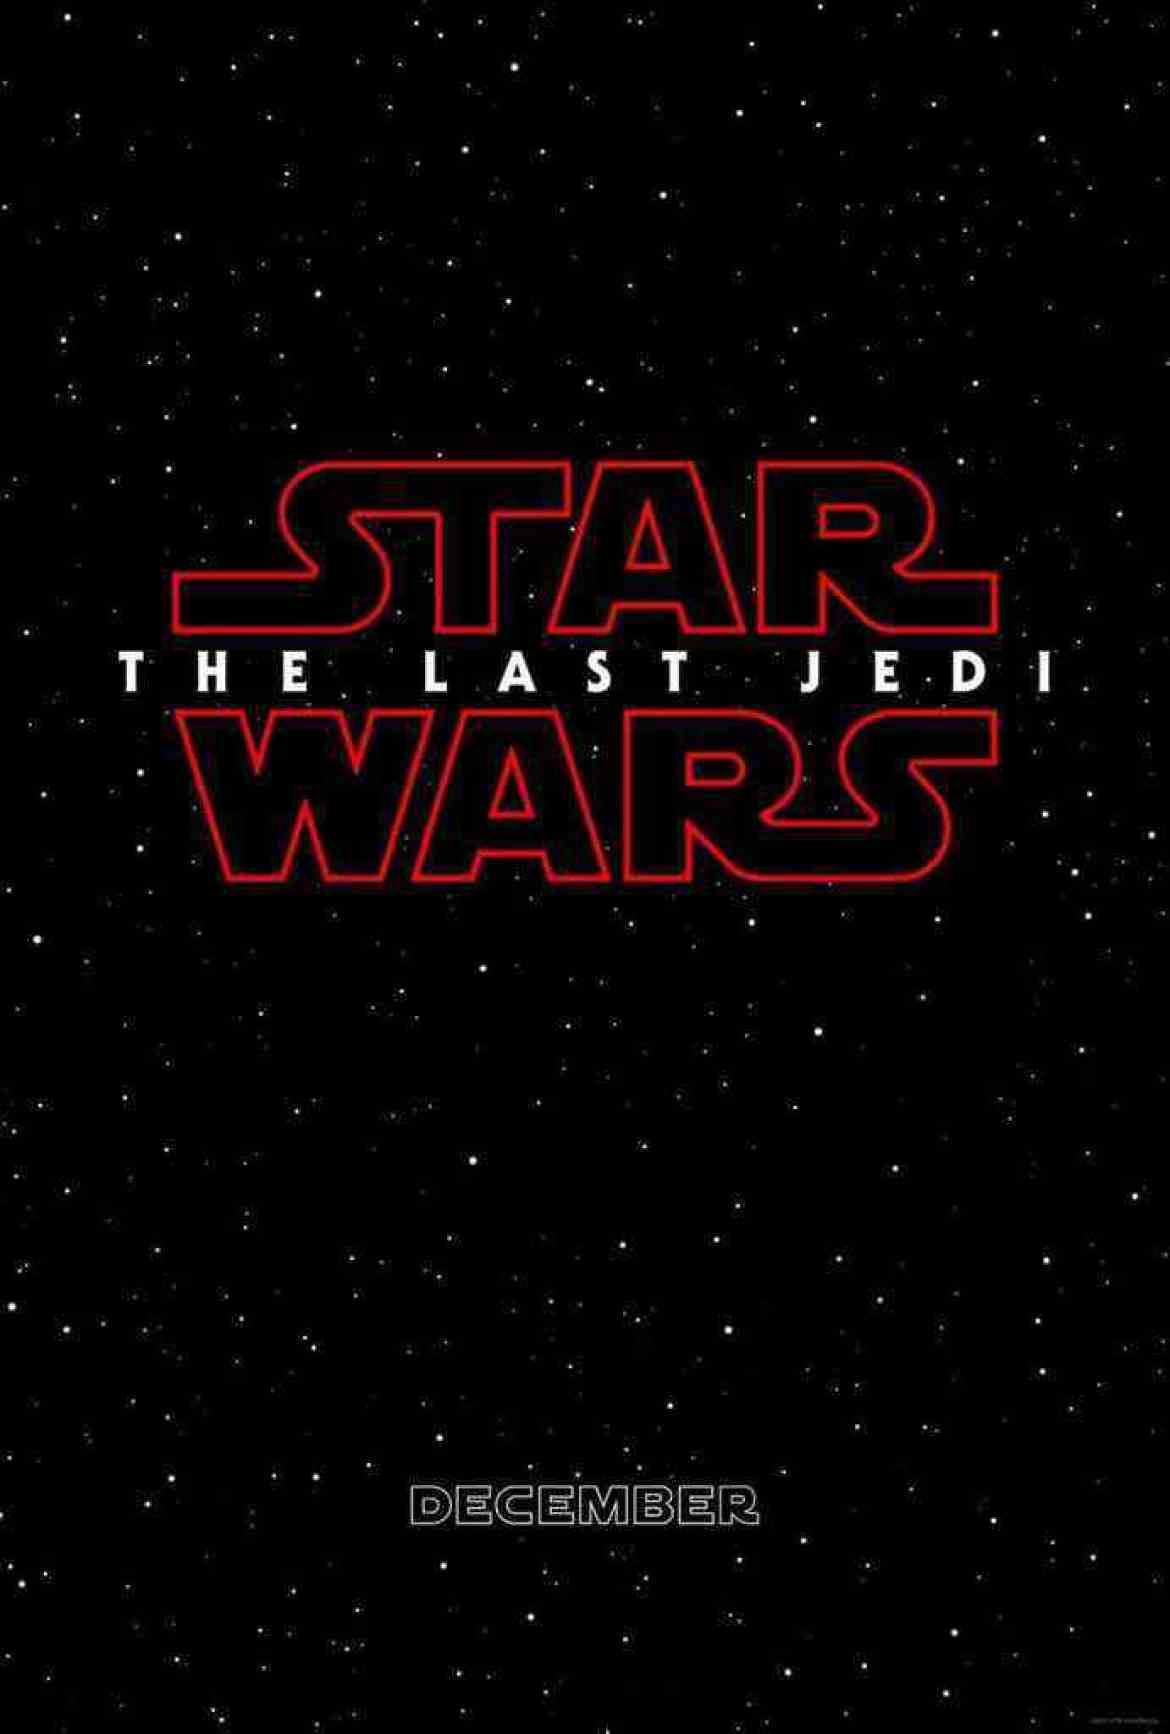 IMG 6315 - Star Wars Episode VIII: The Last Jedi teaser poster!